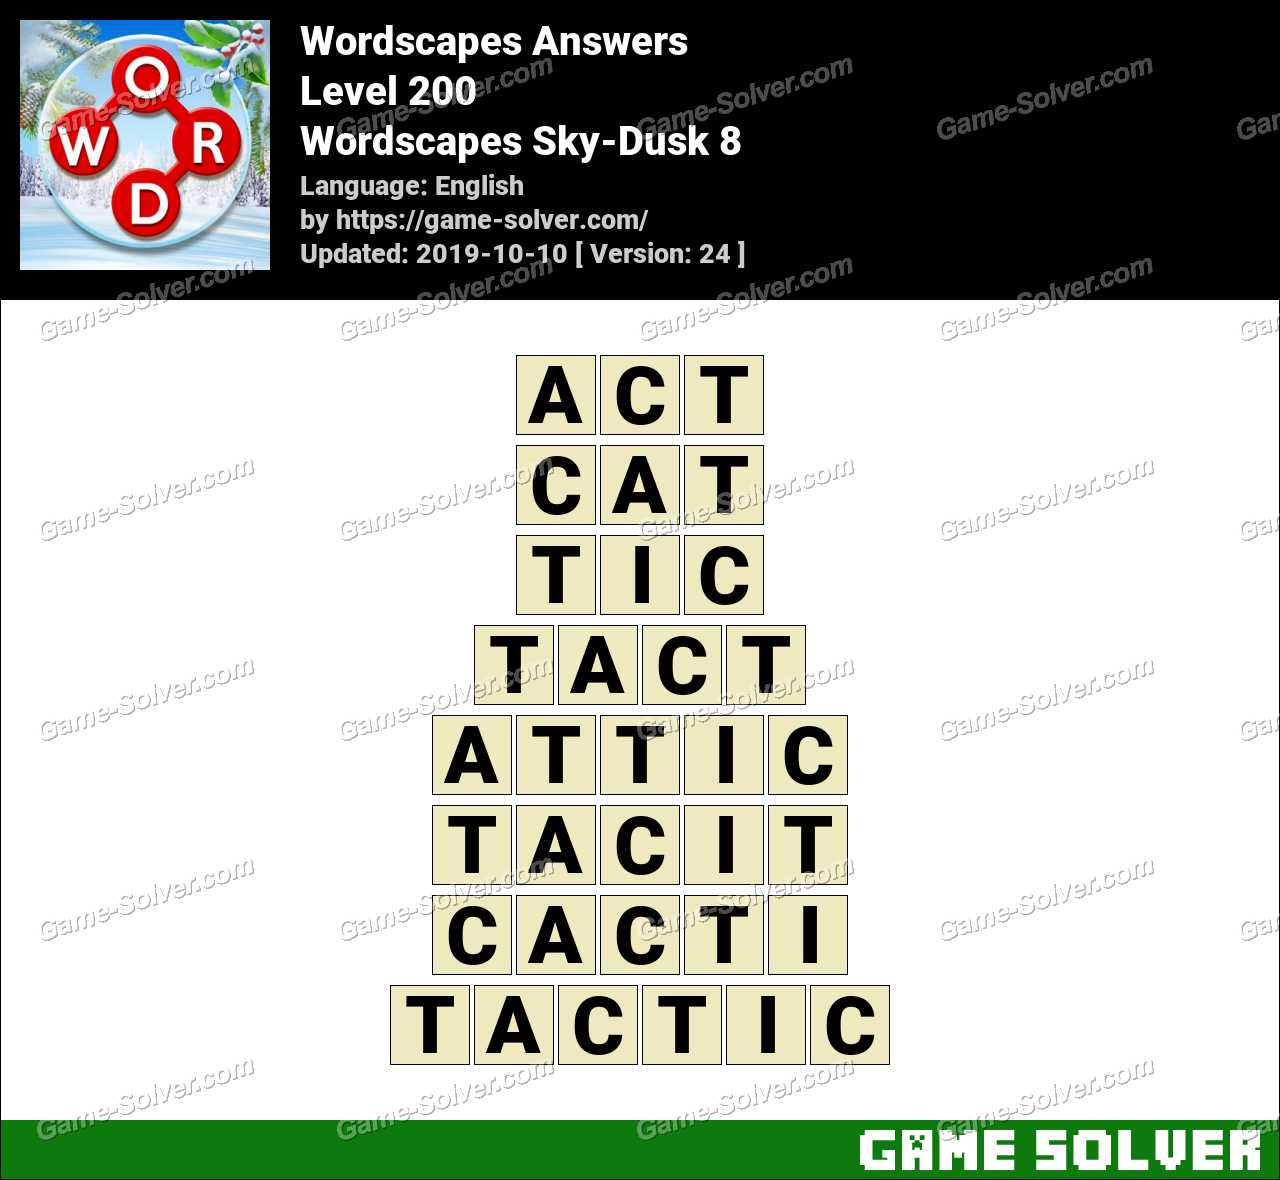 Wordscapes Sky-Dusk 8 Answers